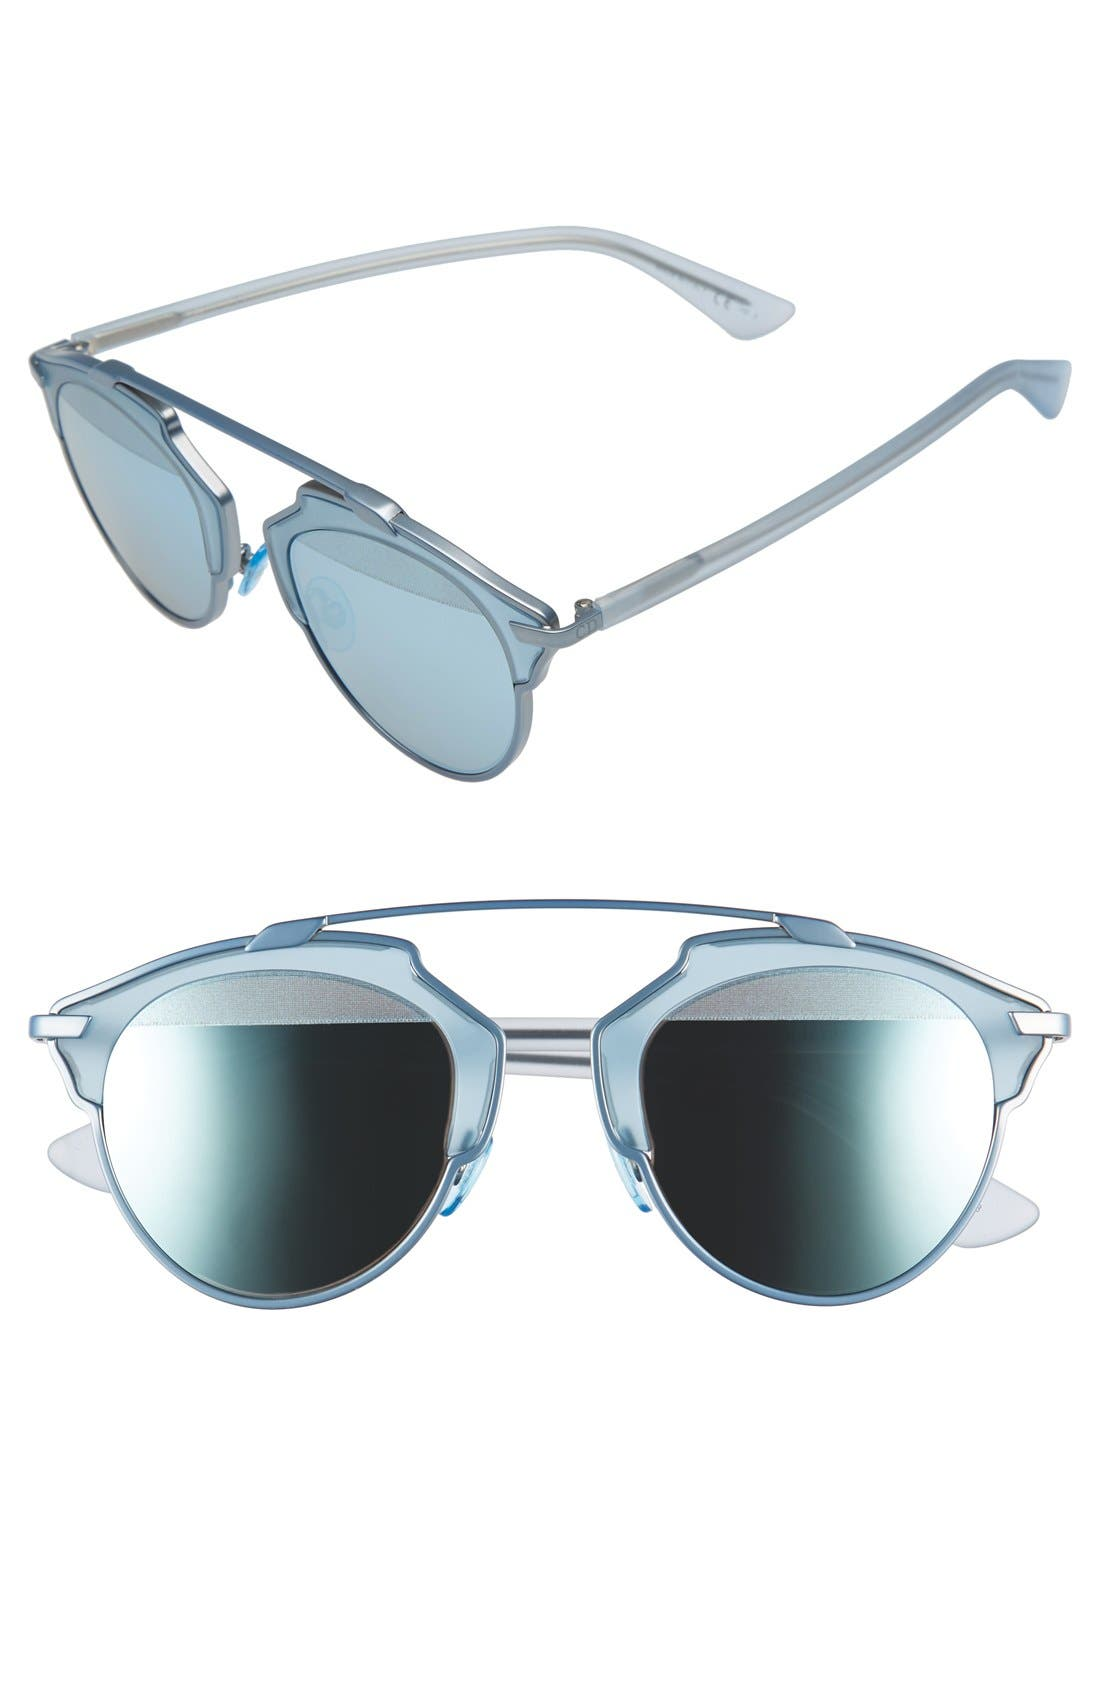 Alternate Image 1 Selected - Dior So Real 48mm Brow Bar Sunglasses